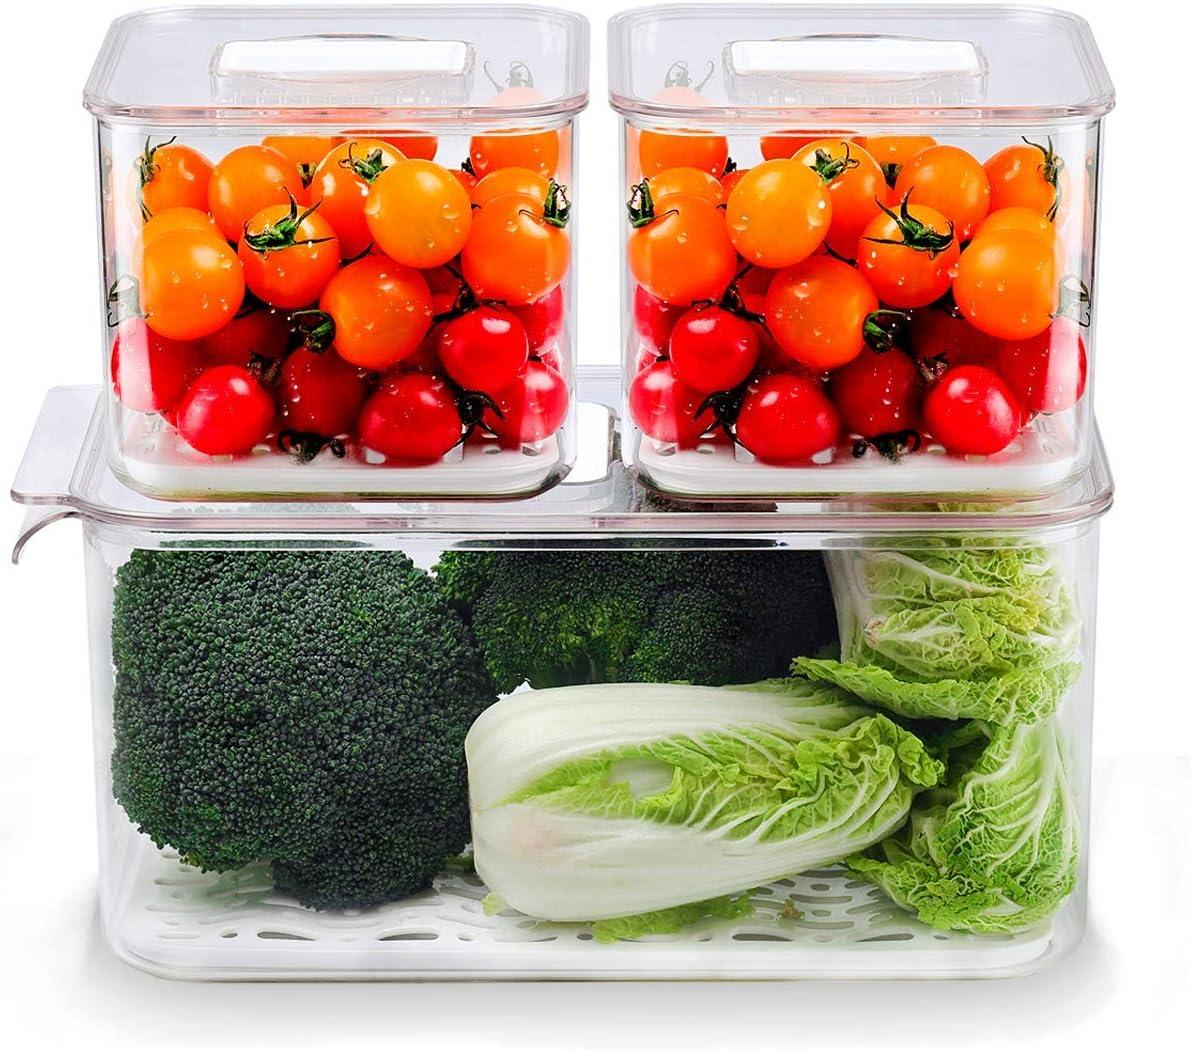 AJY Food Storage Containers,Fridge Produce Saver,Fresh Vegetable Fruit Storage Keeper,BPA-free Fridge Storage Container, (Set of 3)